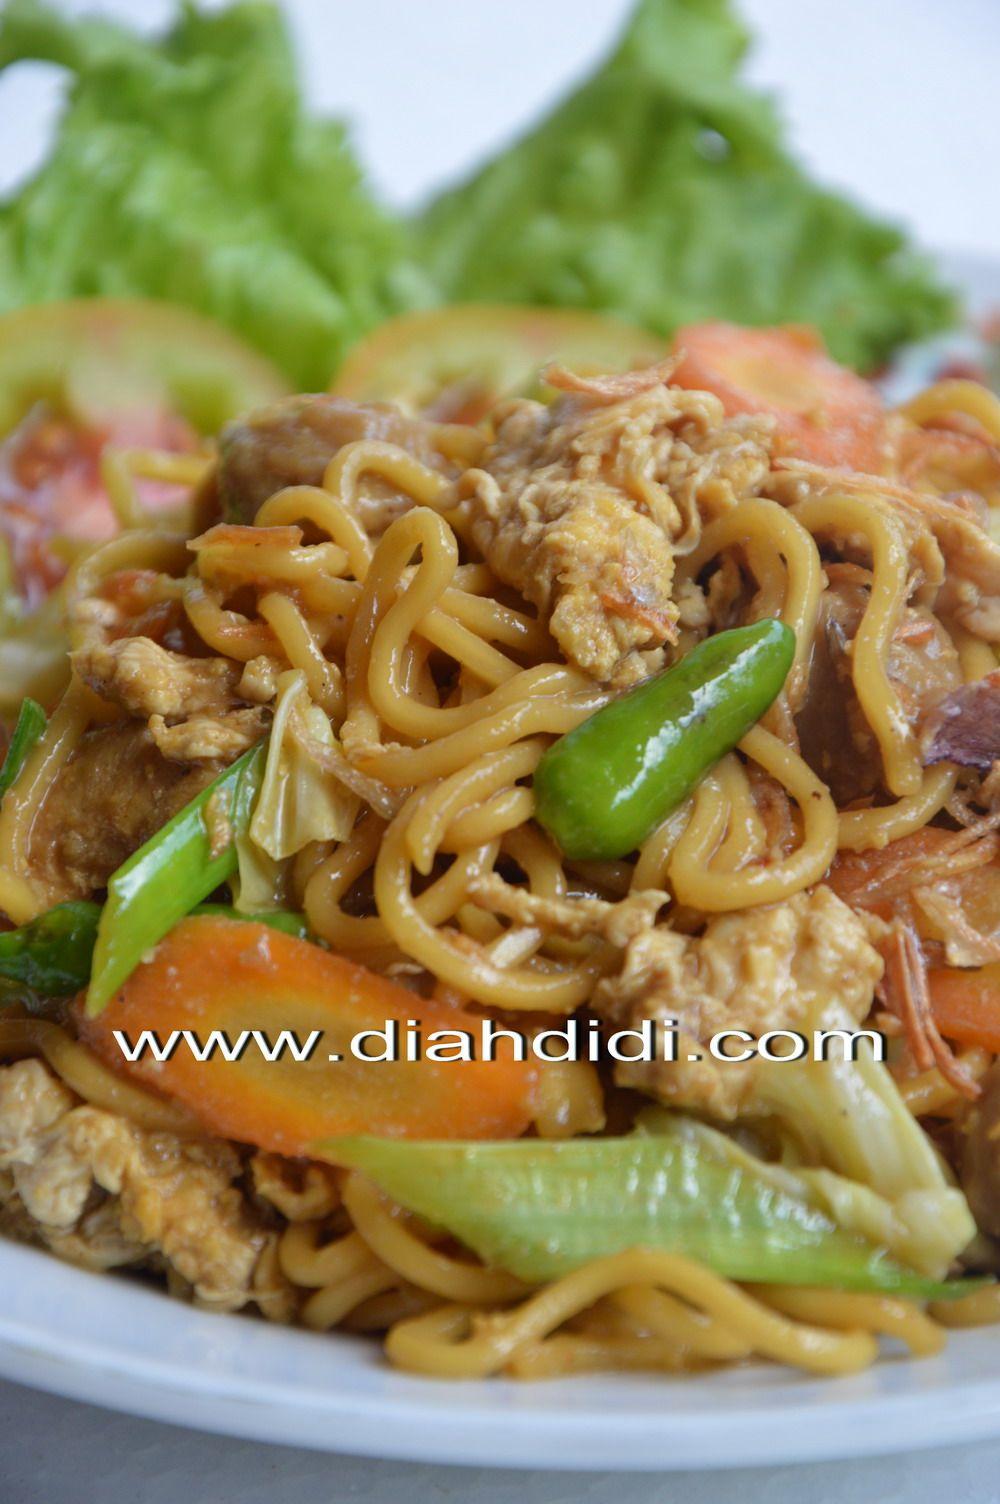 Blog Diah Didi Berisi Resep Masakan Praktis Yang Mudah Dipraktekkan Di Rumah Resep Masakan Resep Masakan Sehat Masakan Asia